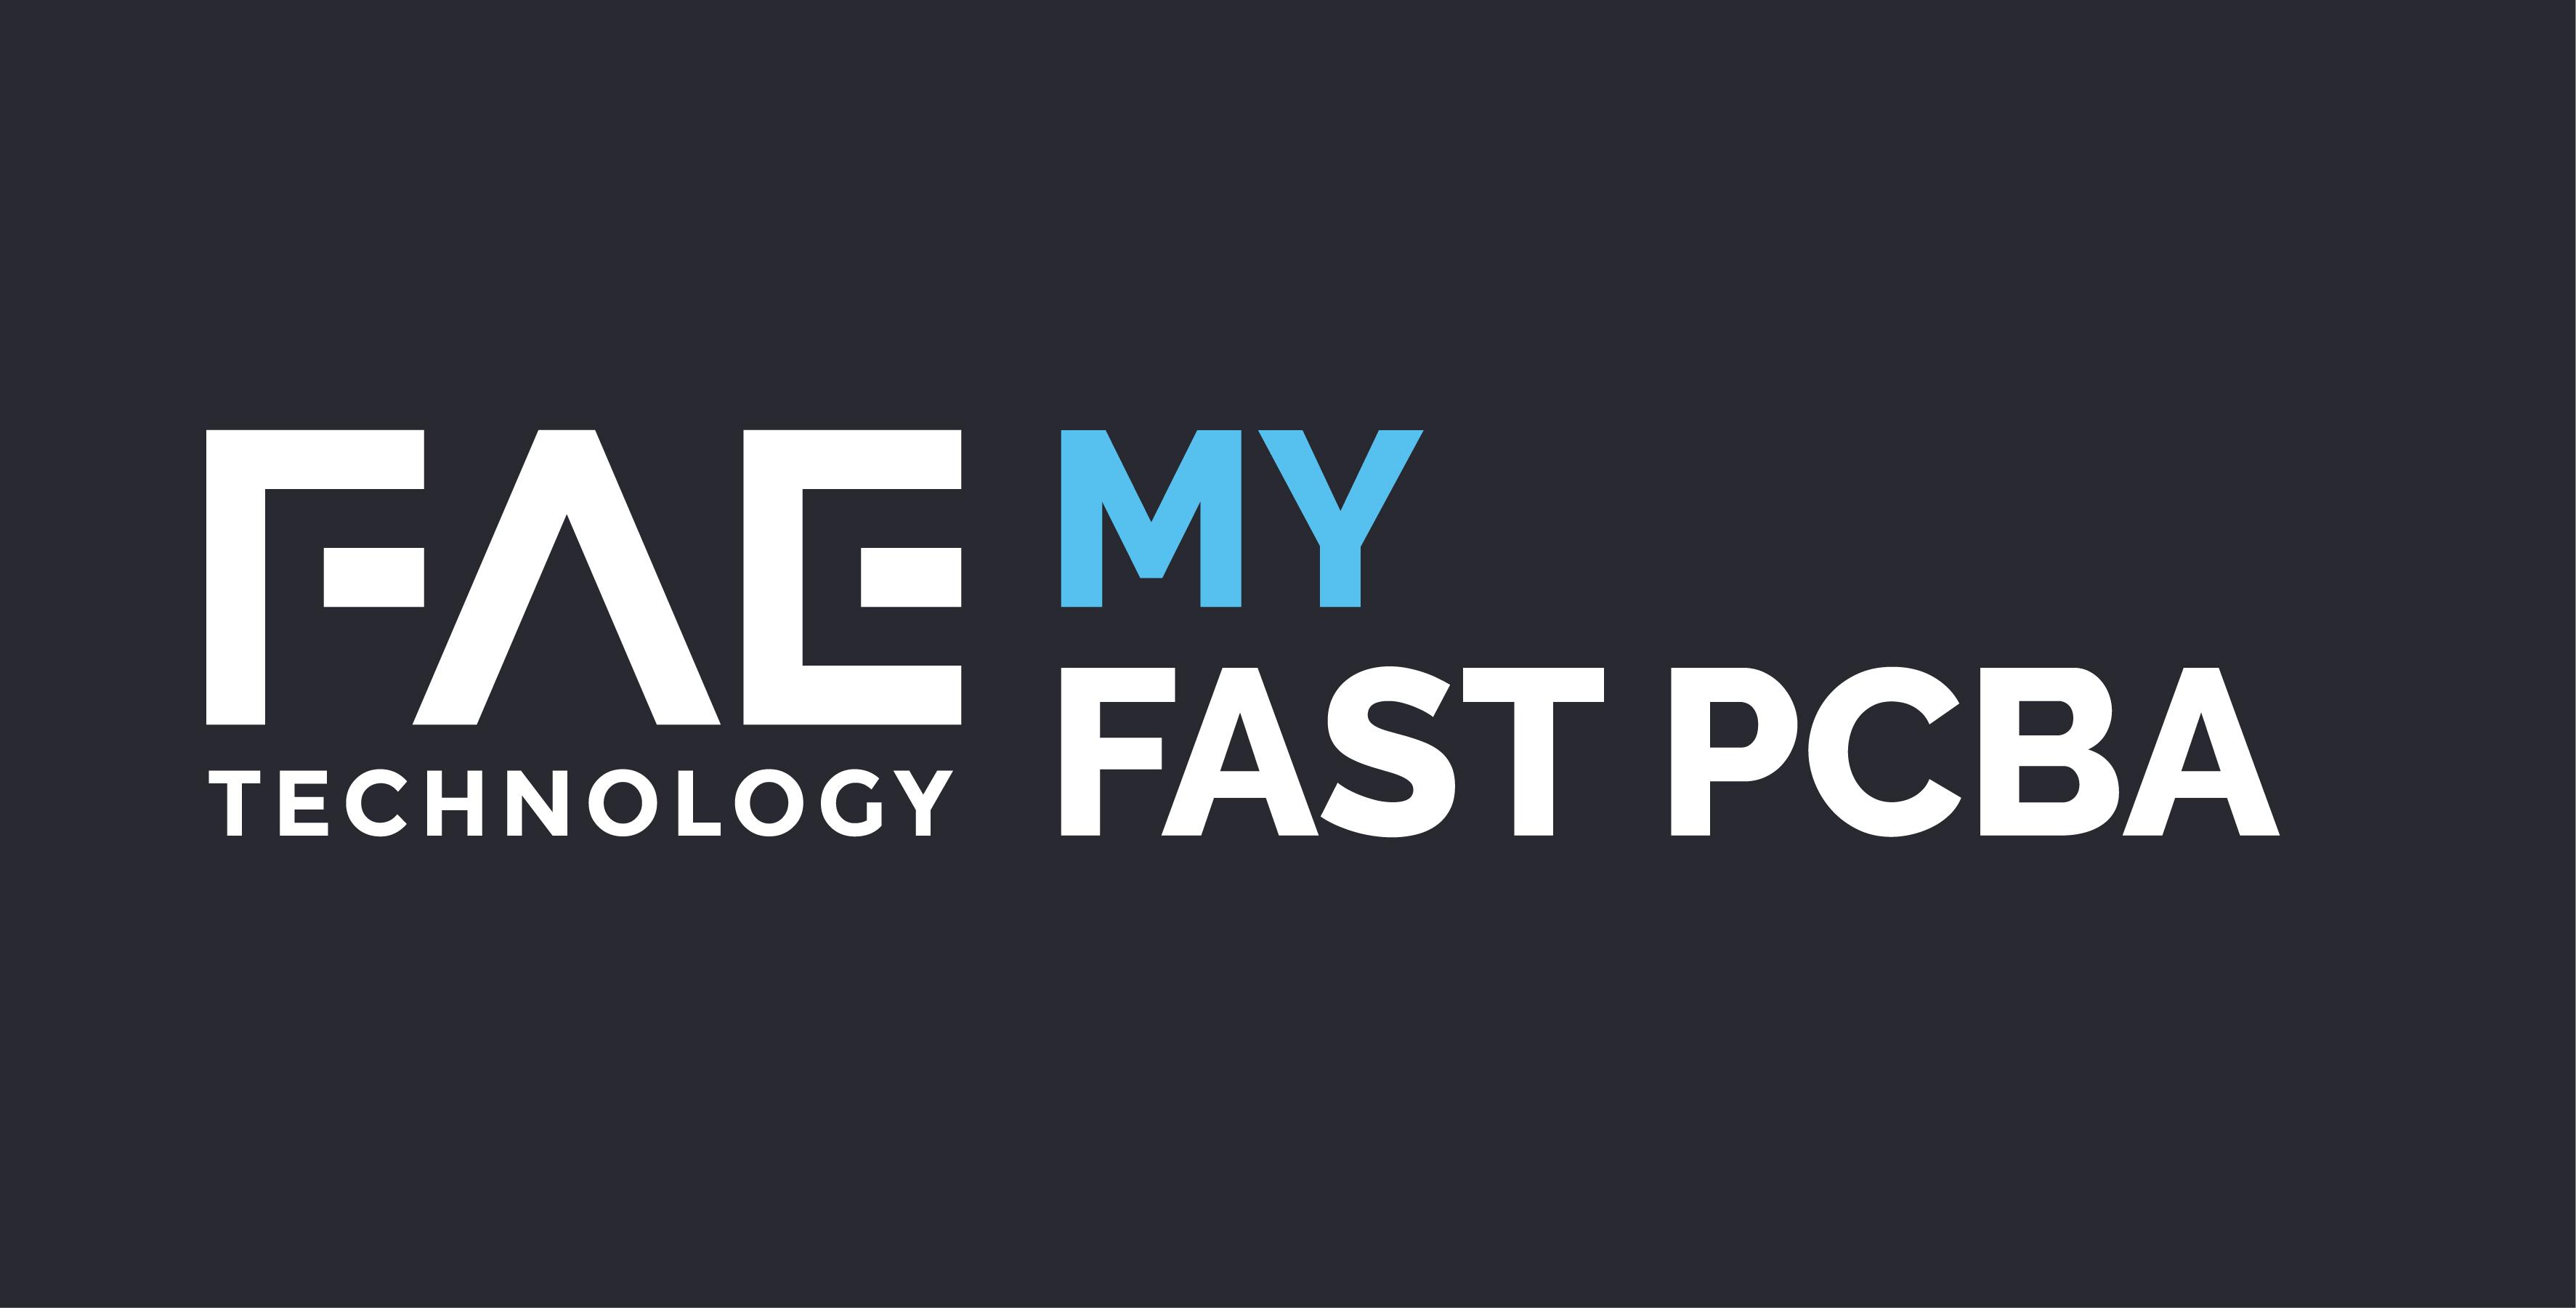 Www.myfastpcba.com